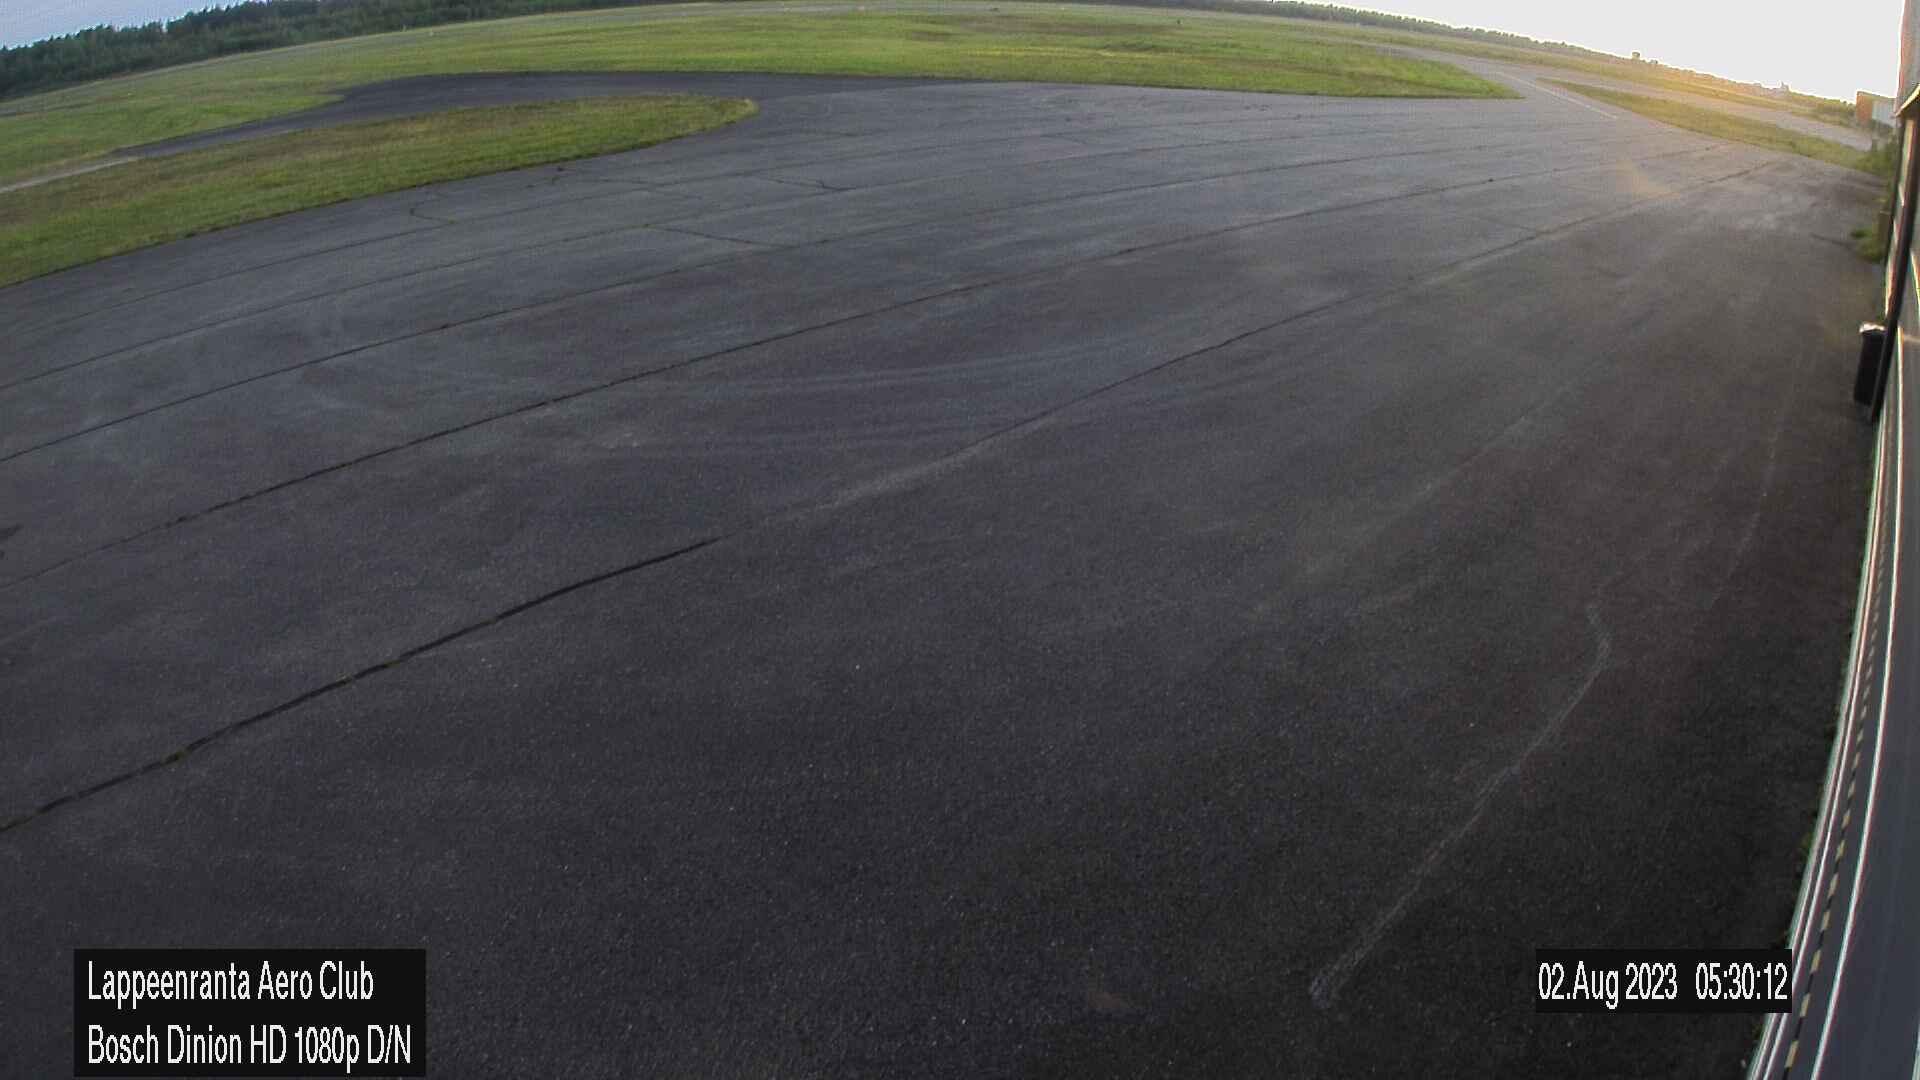 Webcam Lappeenranta: Aero Club